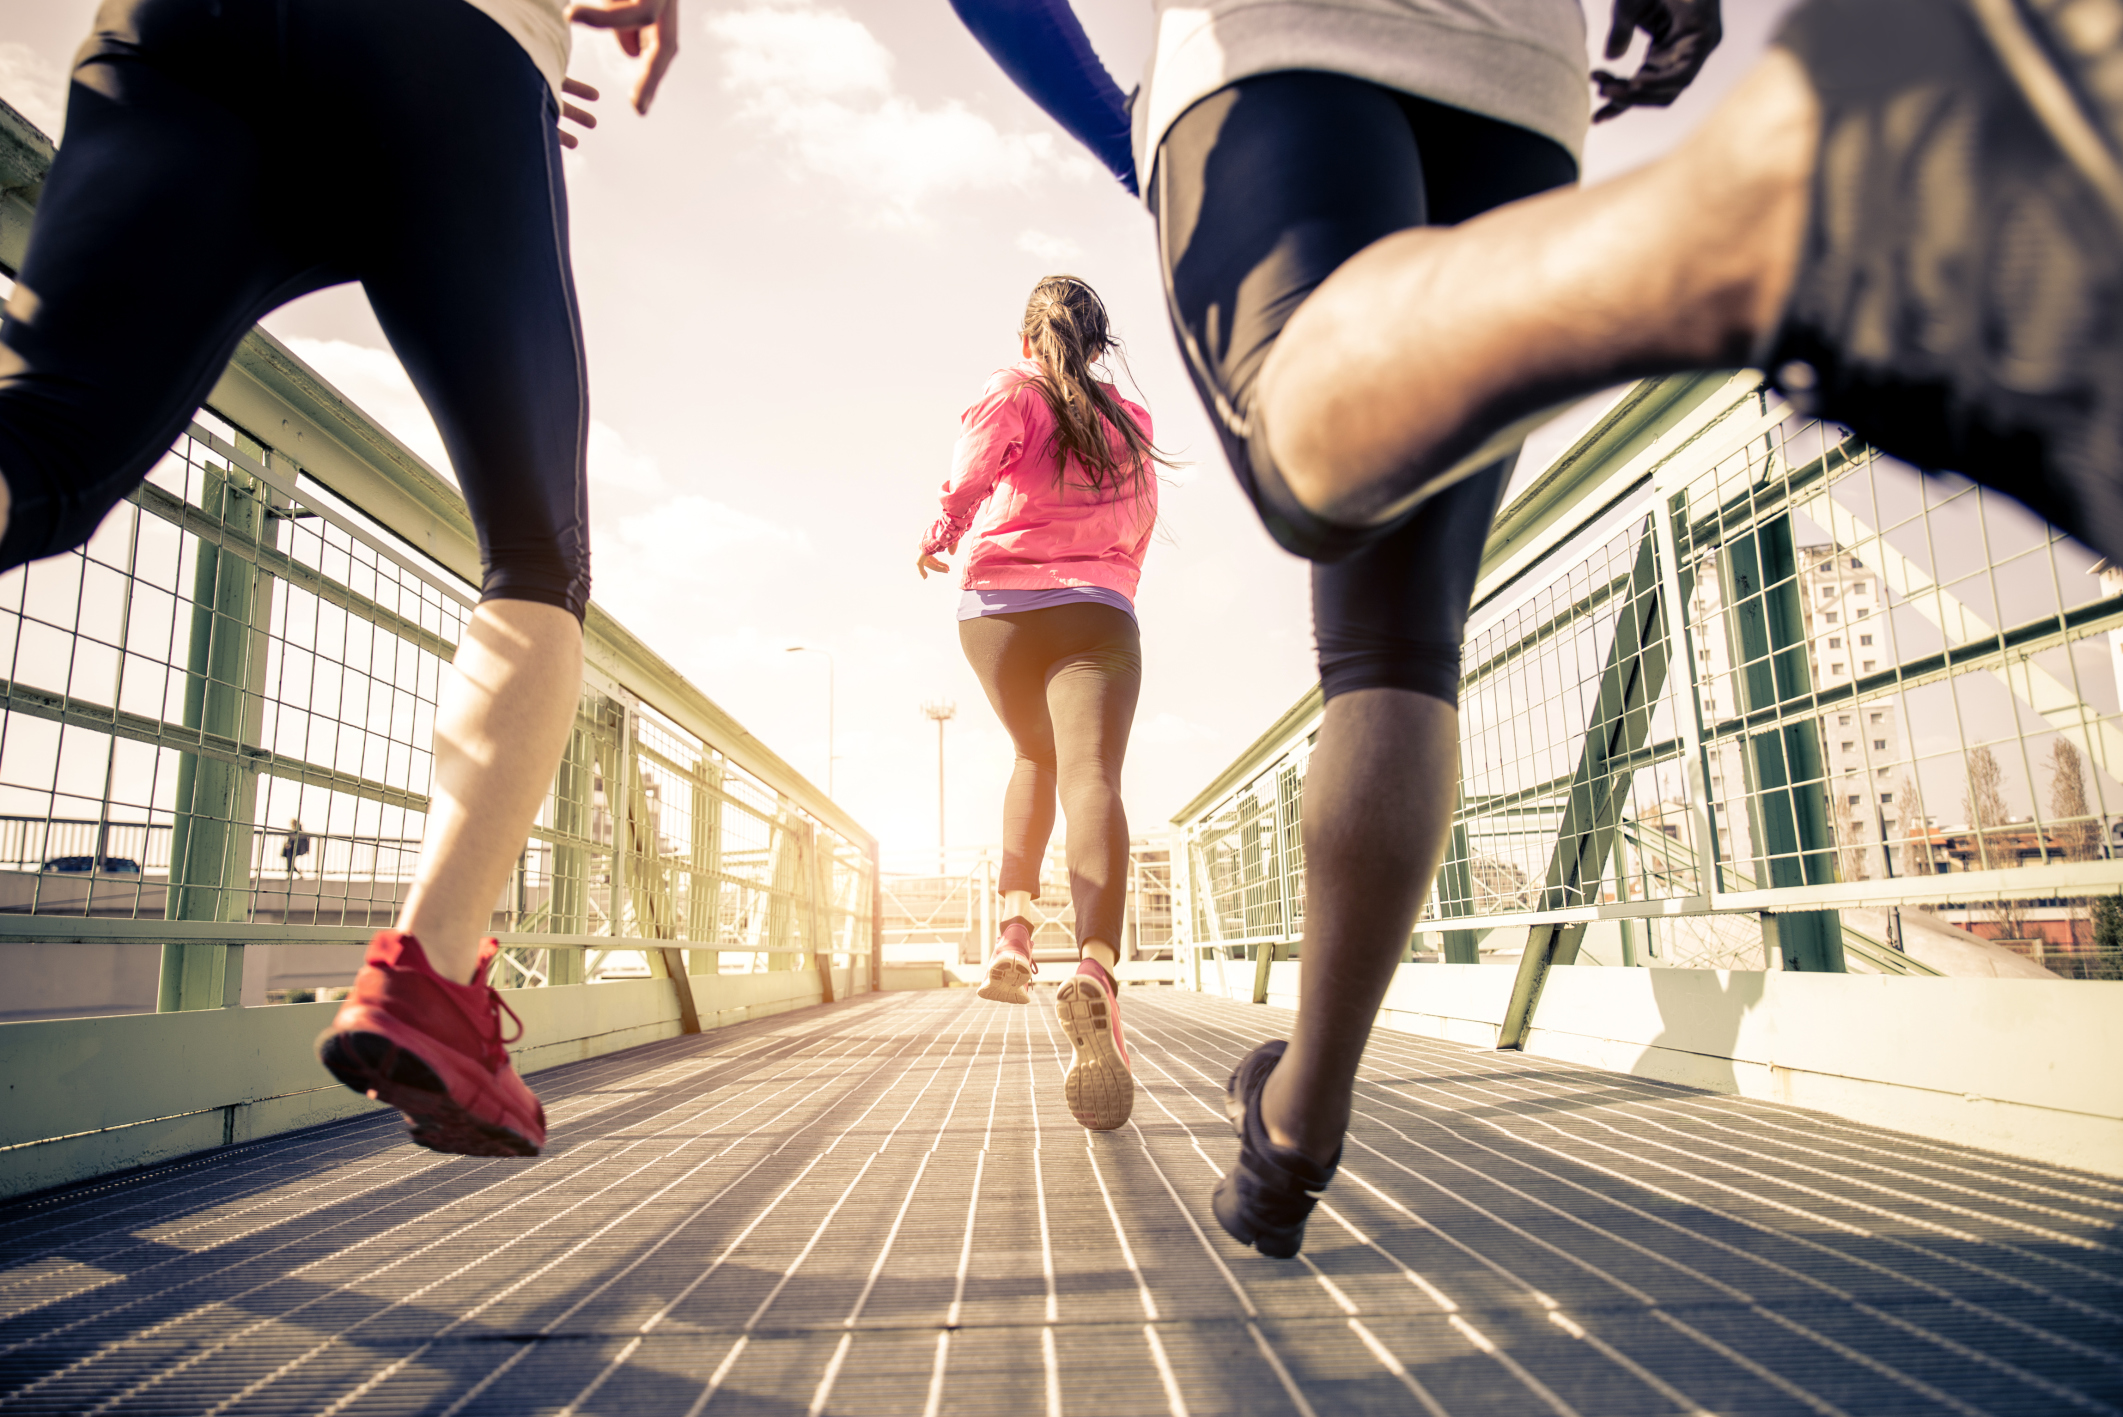 5 factors that make or break a workout